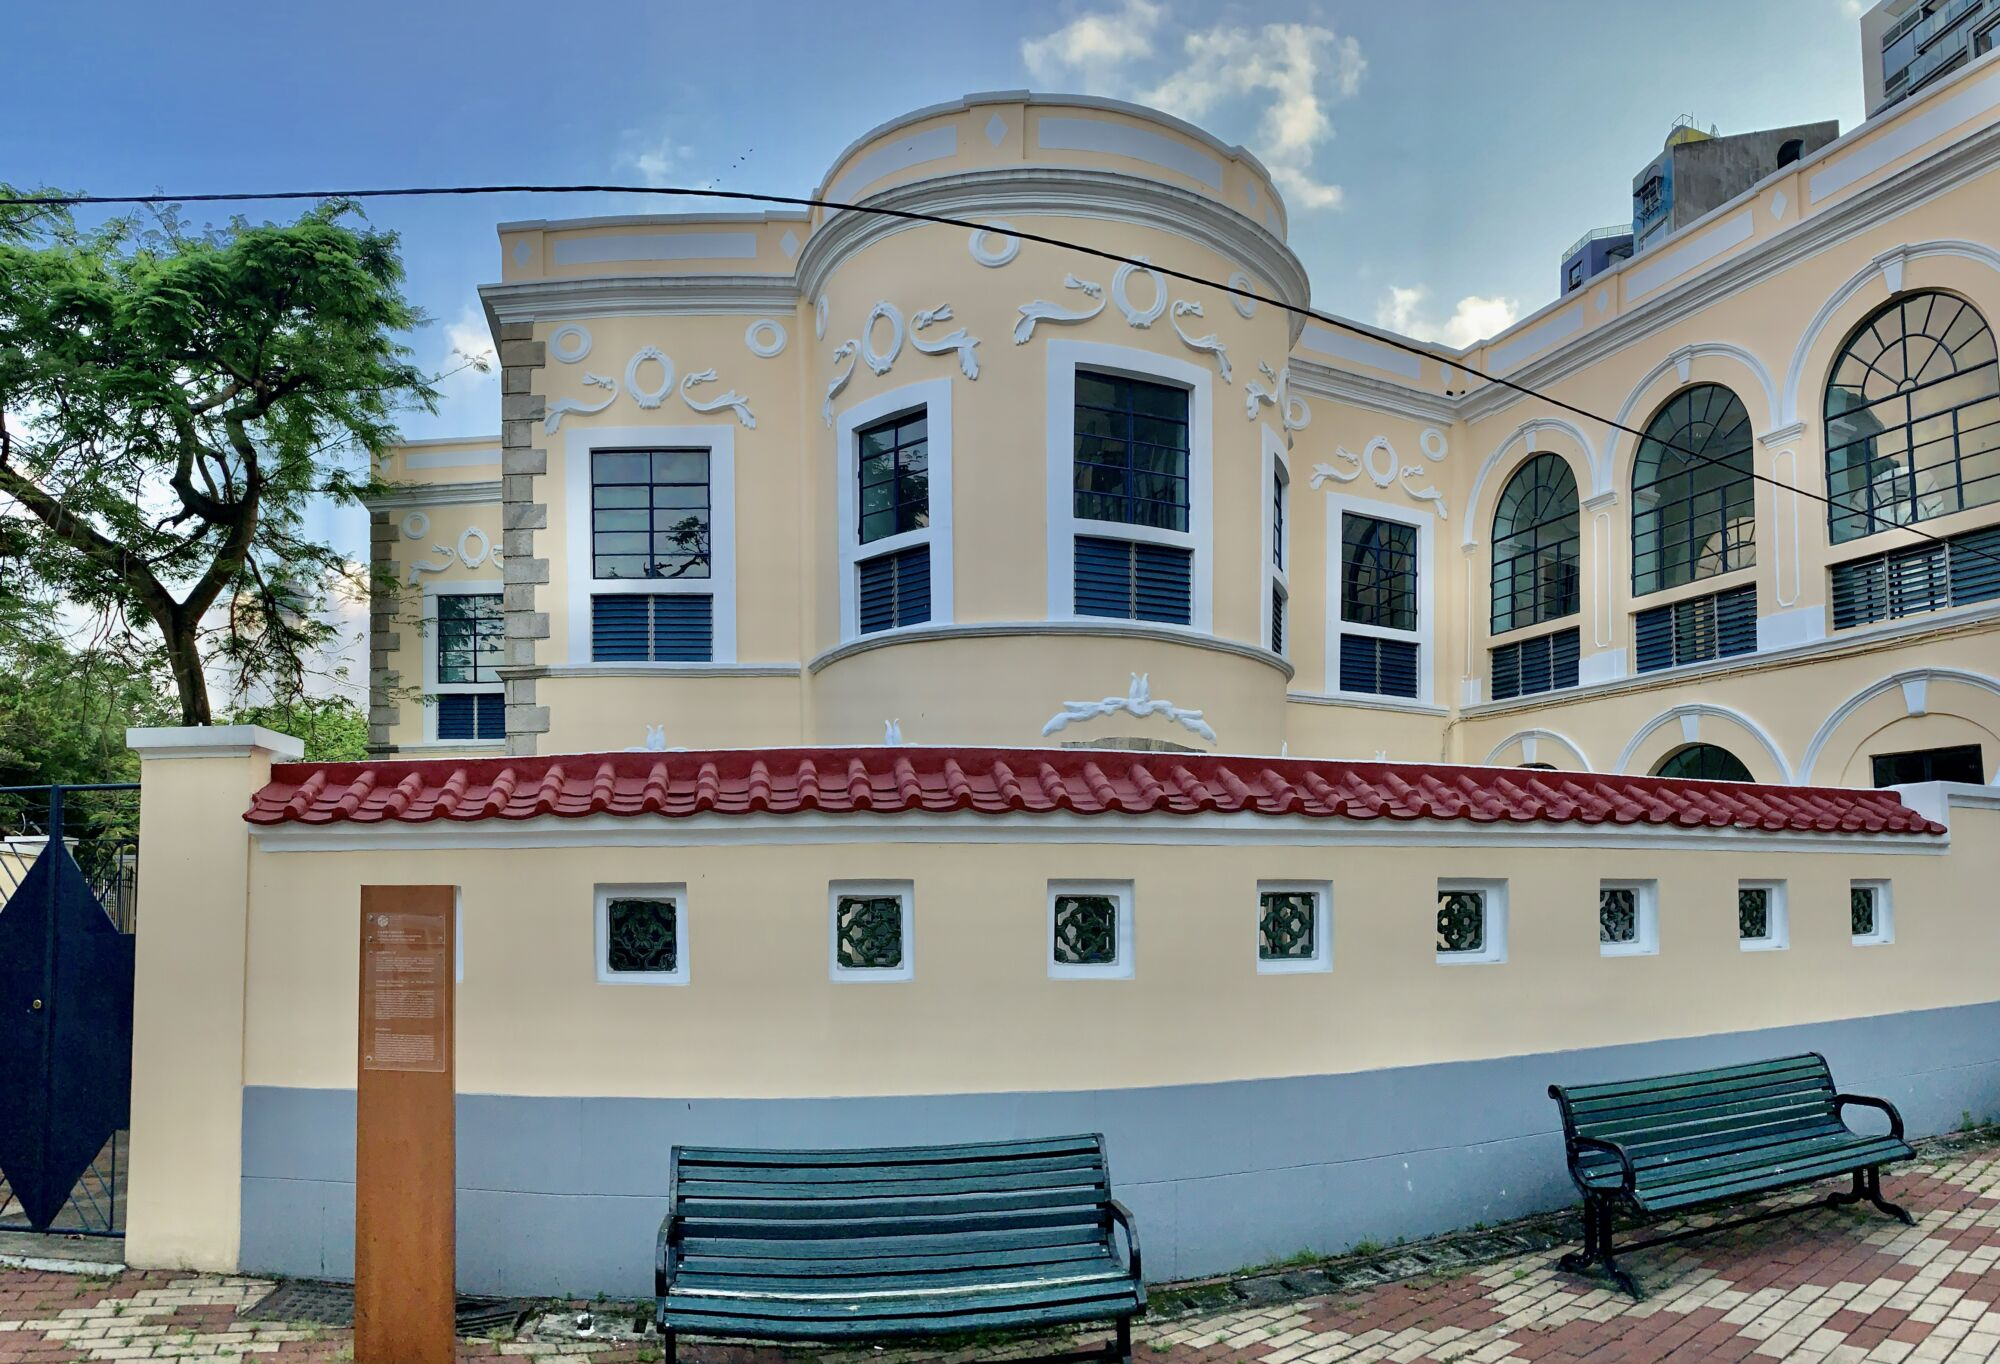 Old Ricci Heritage Panoramic Yellow Building in Sai Van Macau Lifestyle historical stories Macau